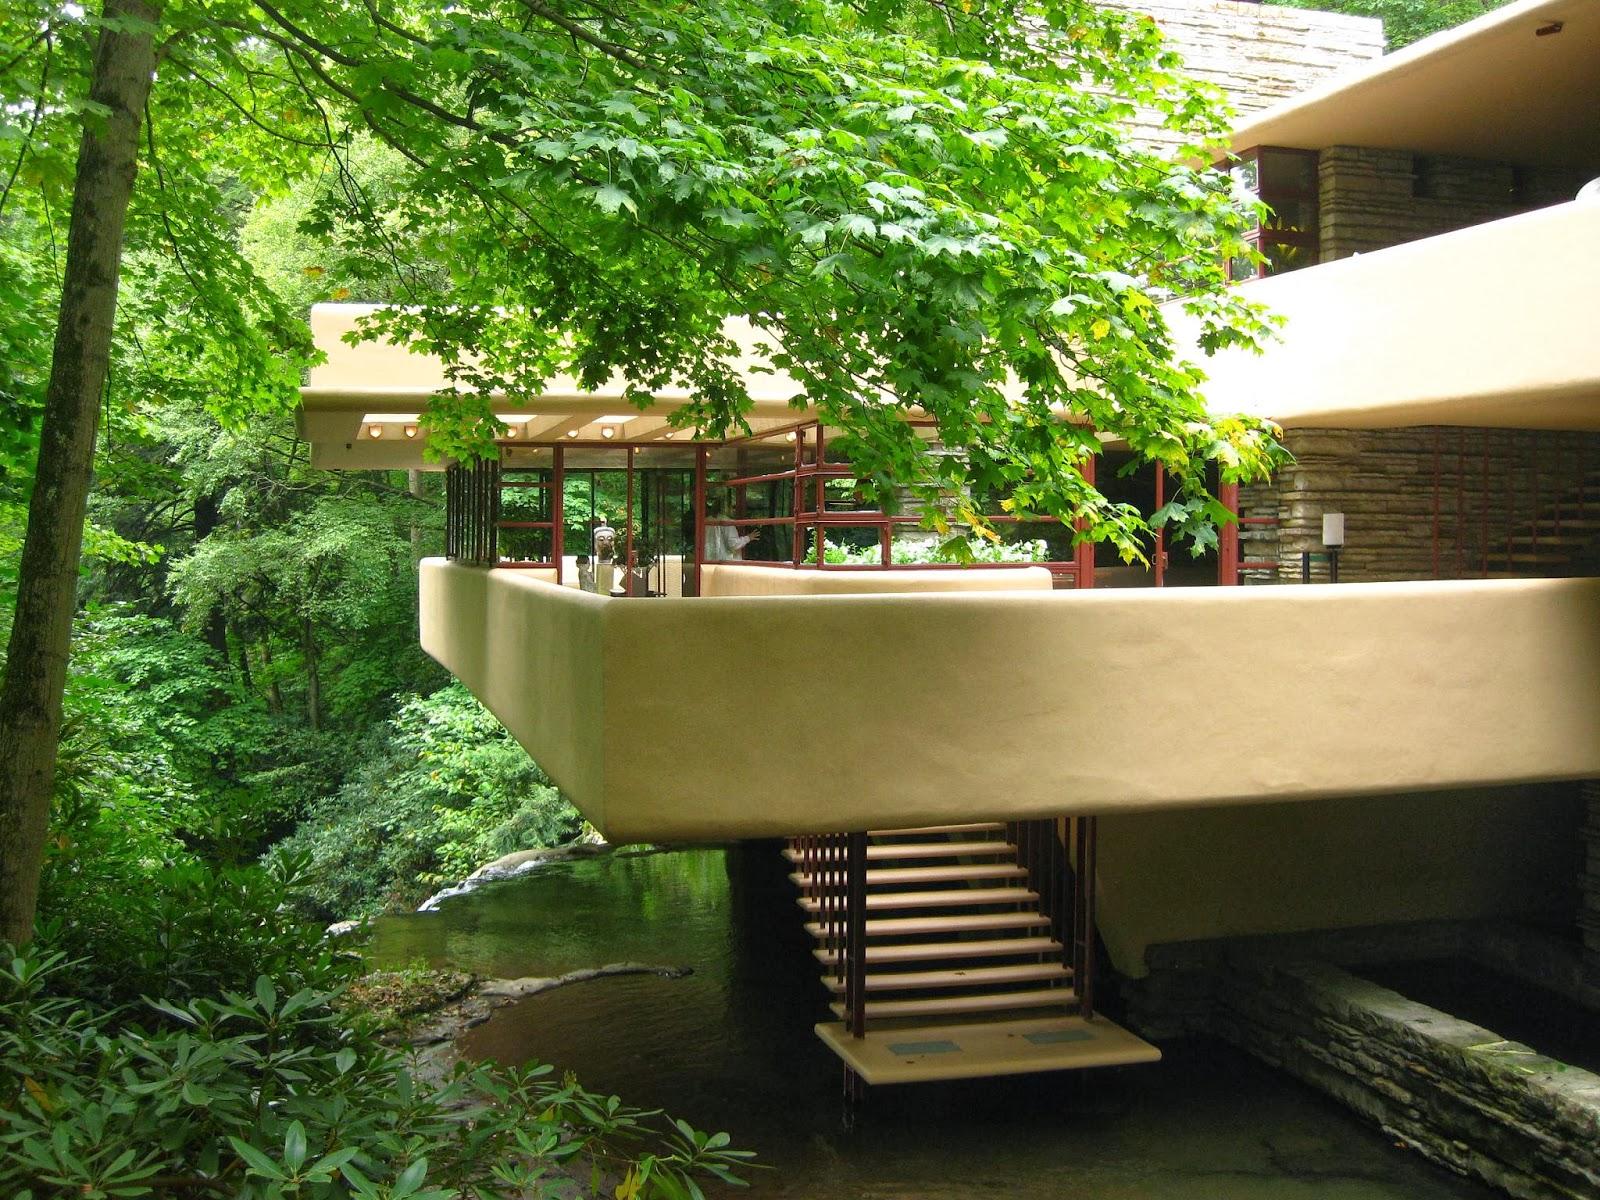 Casa Kauffman o Casa de la Cascada Fallingwater o